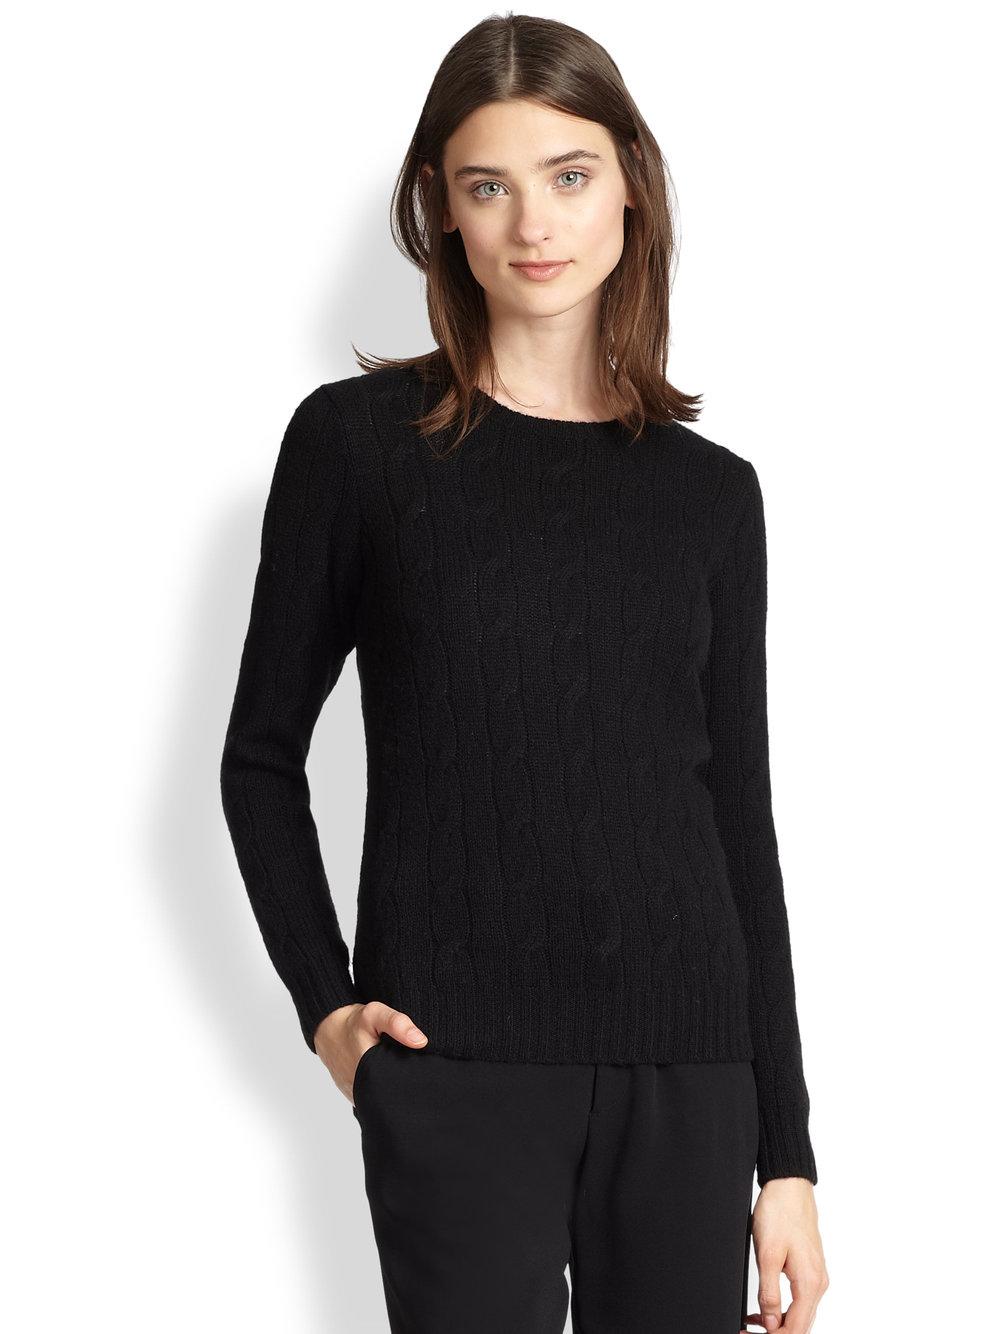 ralph-lauren-black-label-black-cable-knit-cashmere-sweater-product-1-24941173-0-489543126-normal.jpeg